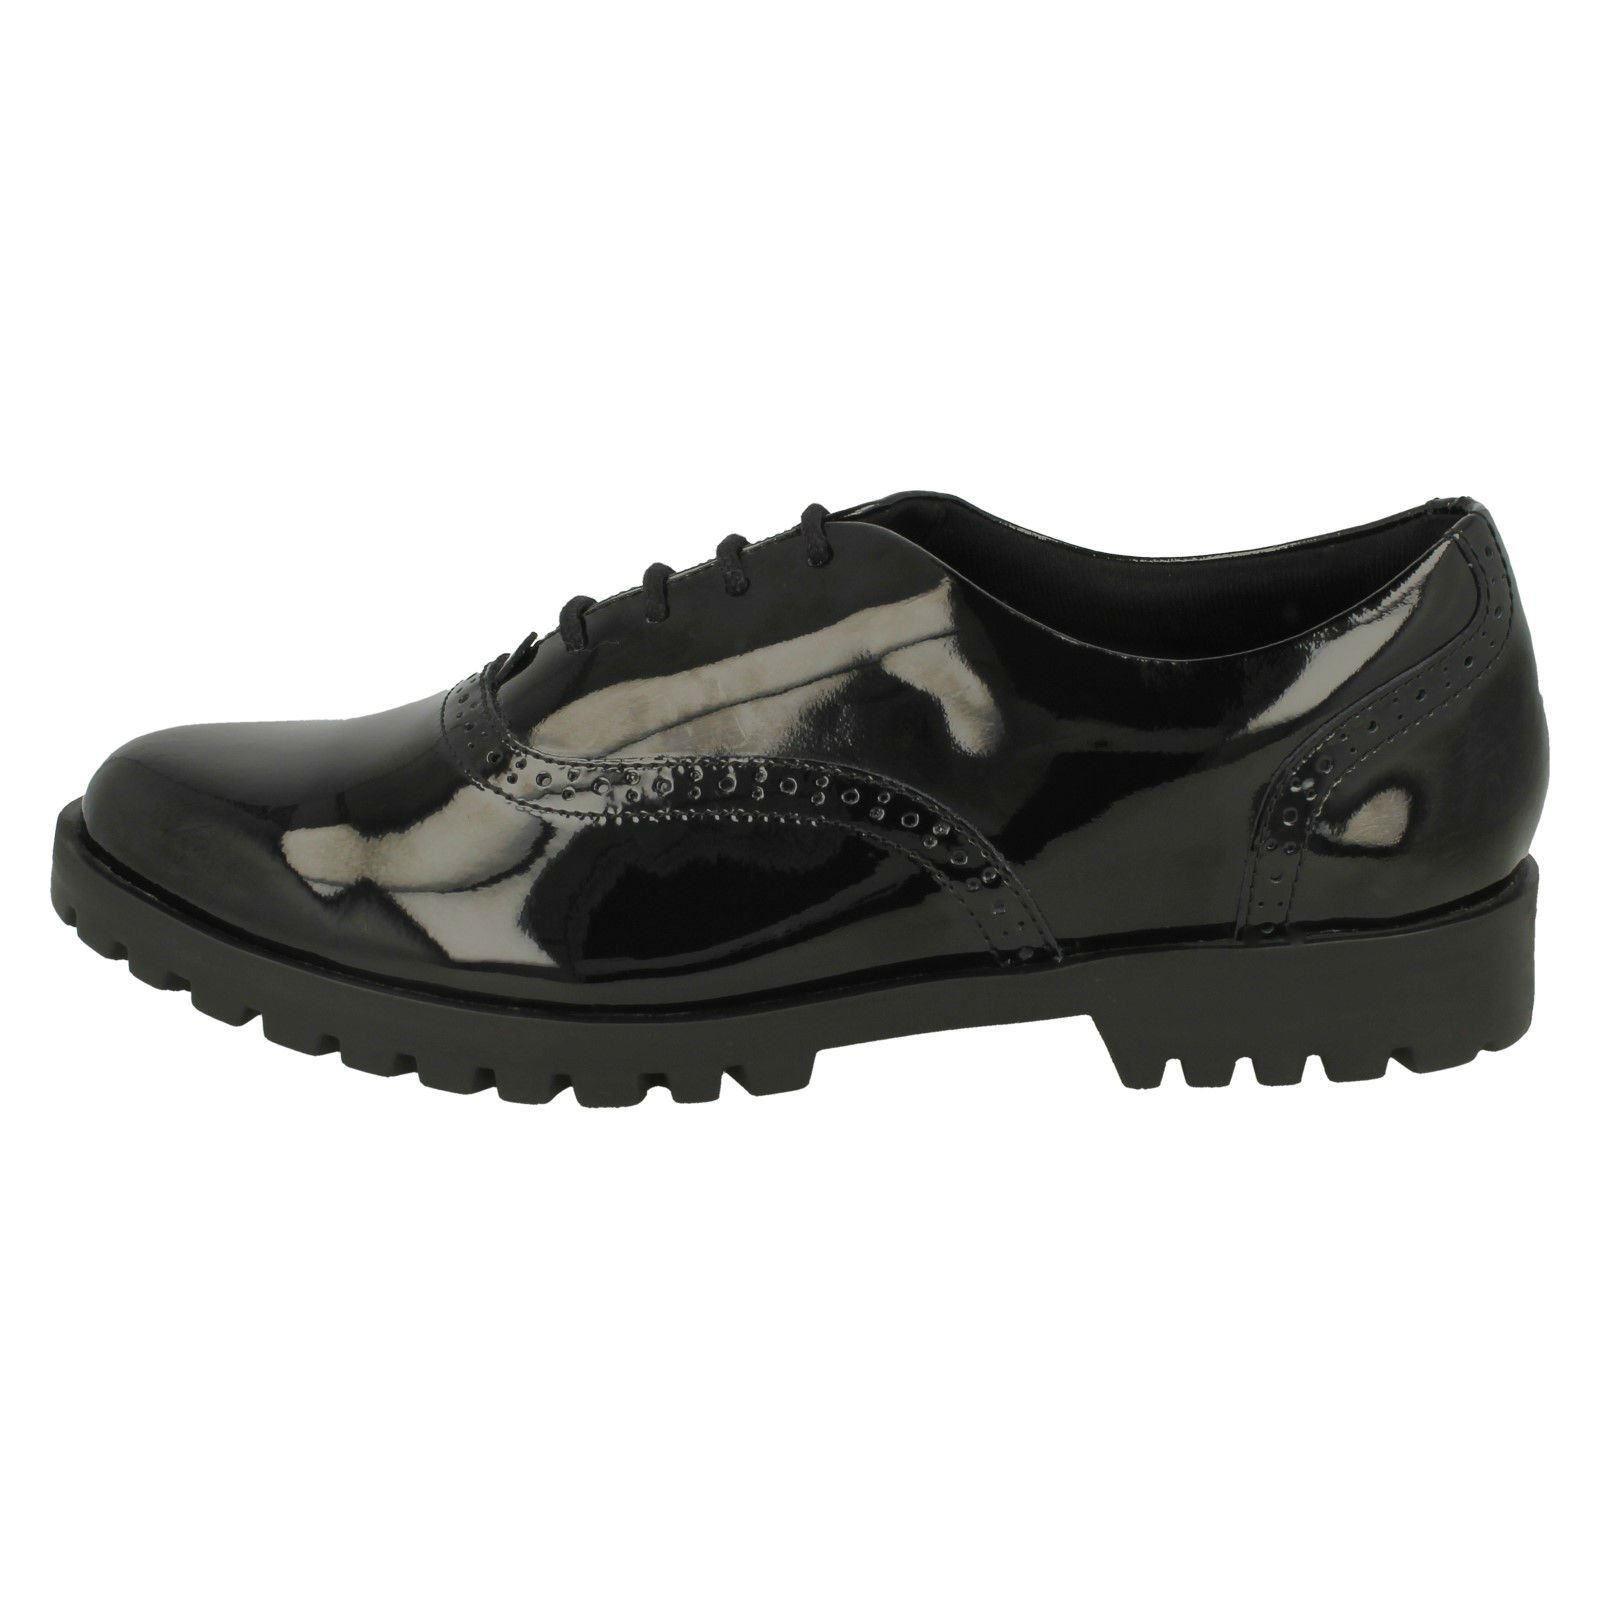 Detallados Brogue Clarks Millie Agnes Niñas Negro Zapatos HS7Xqx8